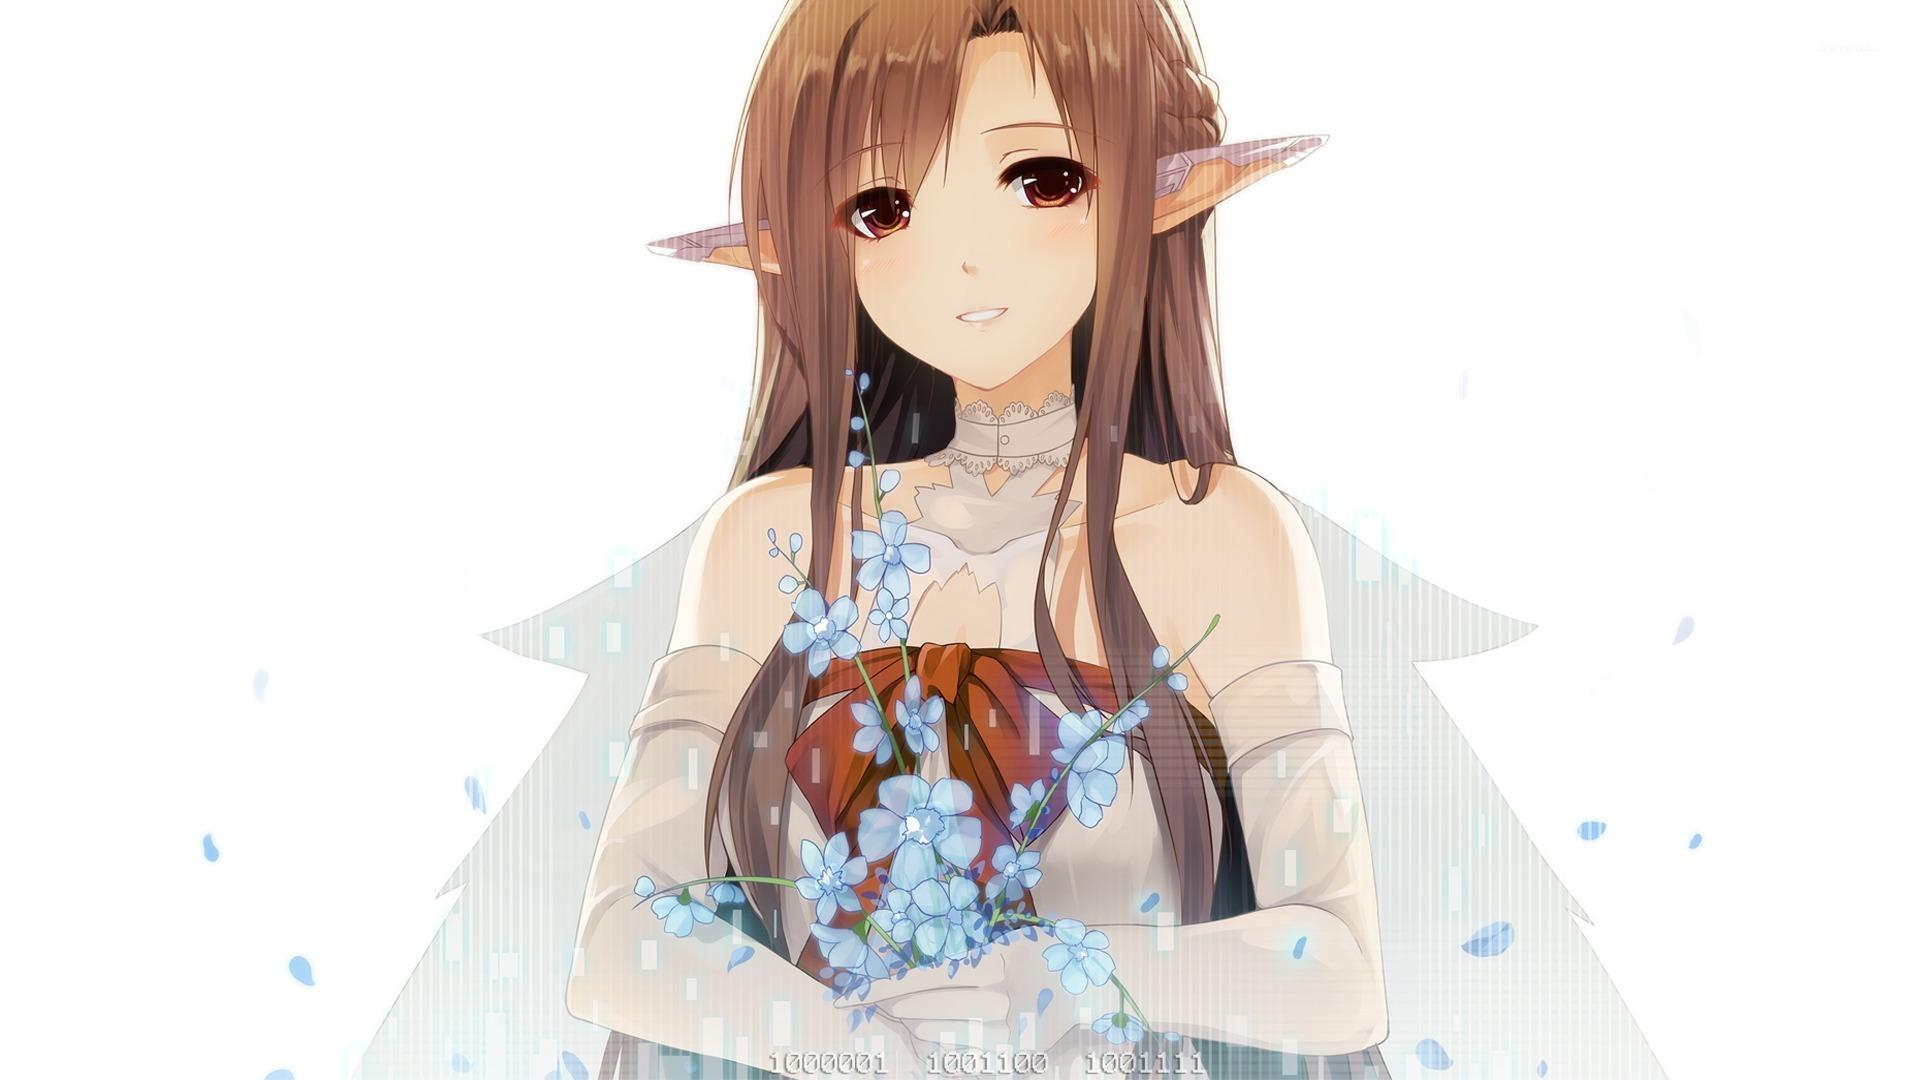 Asuna Sword Art Online 2 Wallpaper Anime Wallpapers 39299